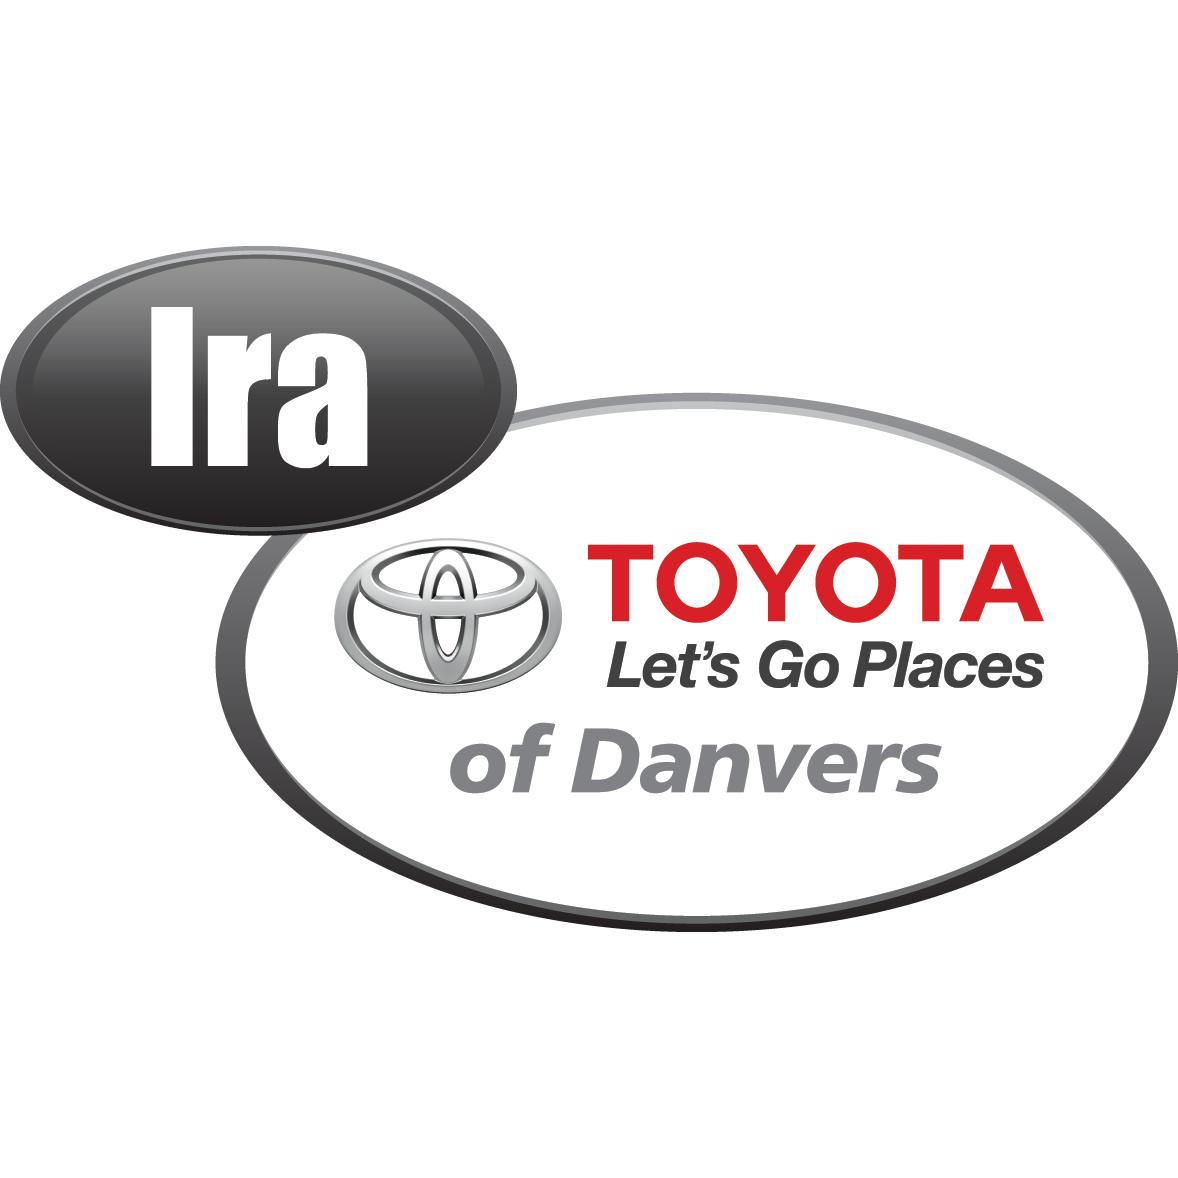 Ira Toyota of Danvers - Danvers, MA - Auto Dealers